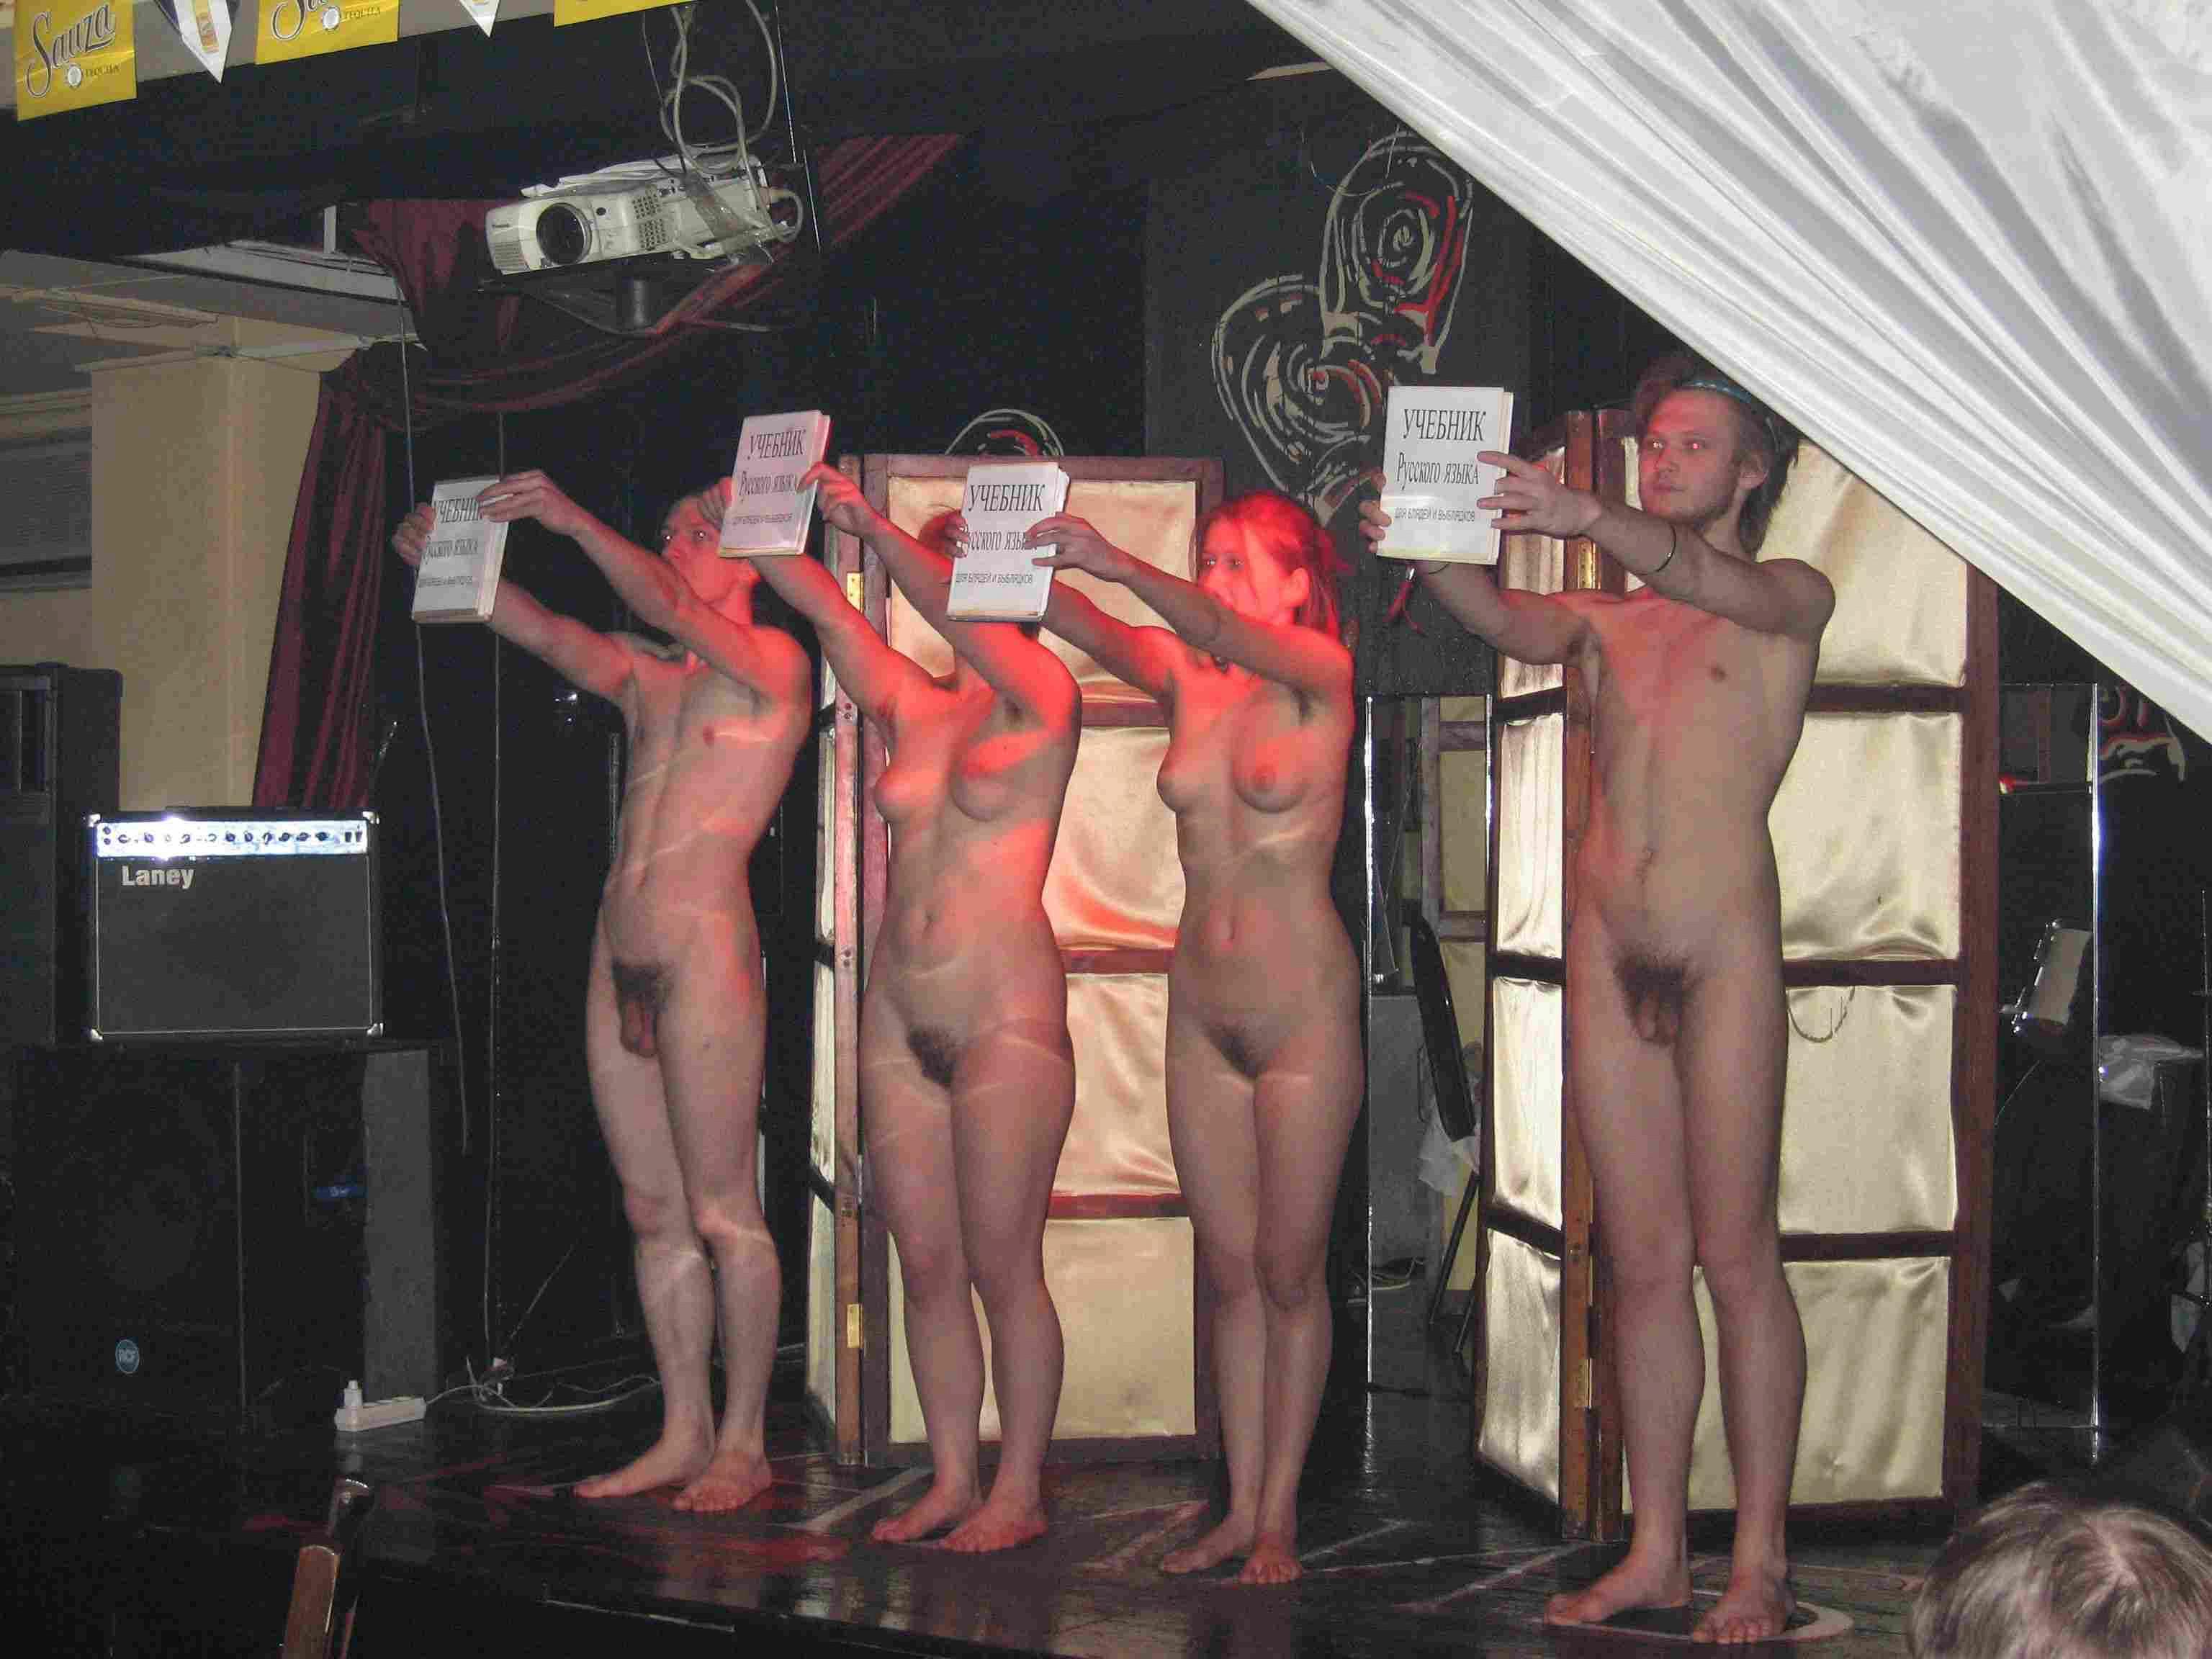 Порно без запрета смотреть  Смотреть порно онлайн на